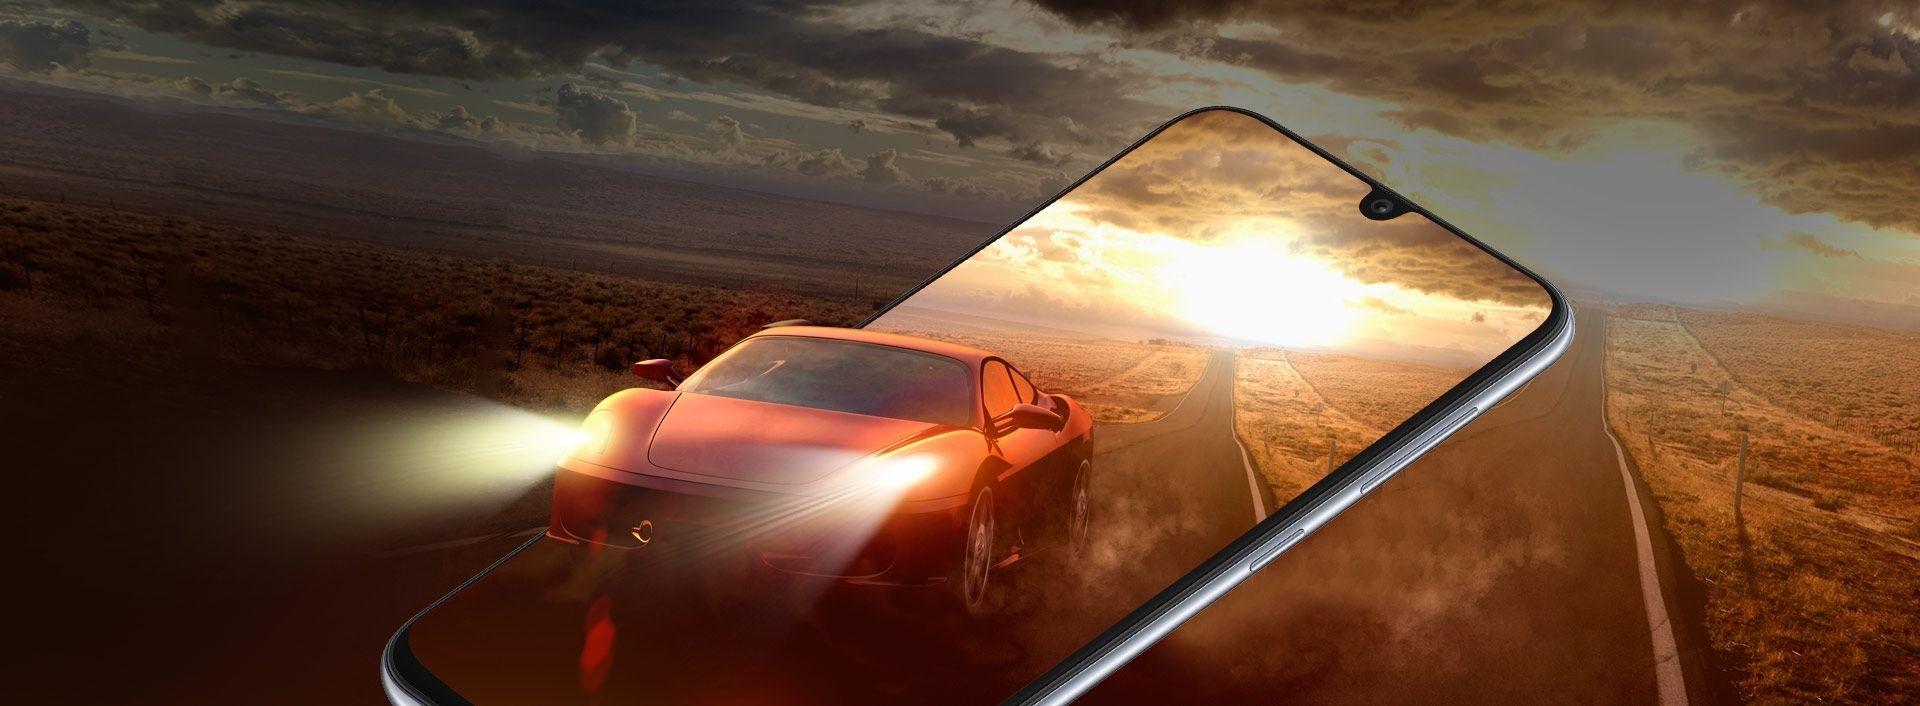 Samsung Galaxy A70 - SDM 675 Octa-Core processor